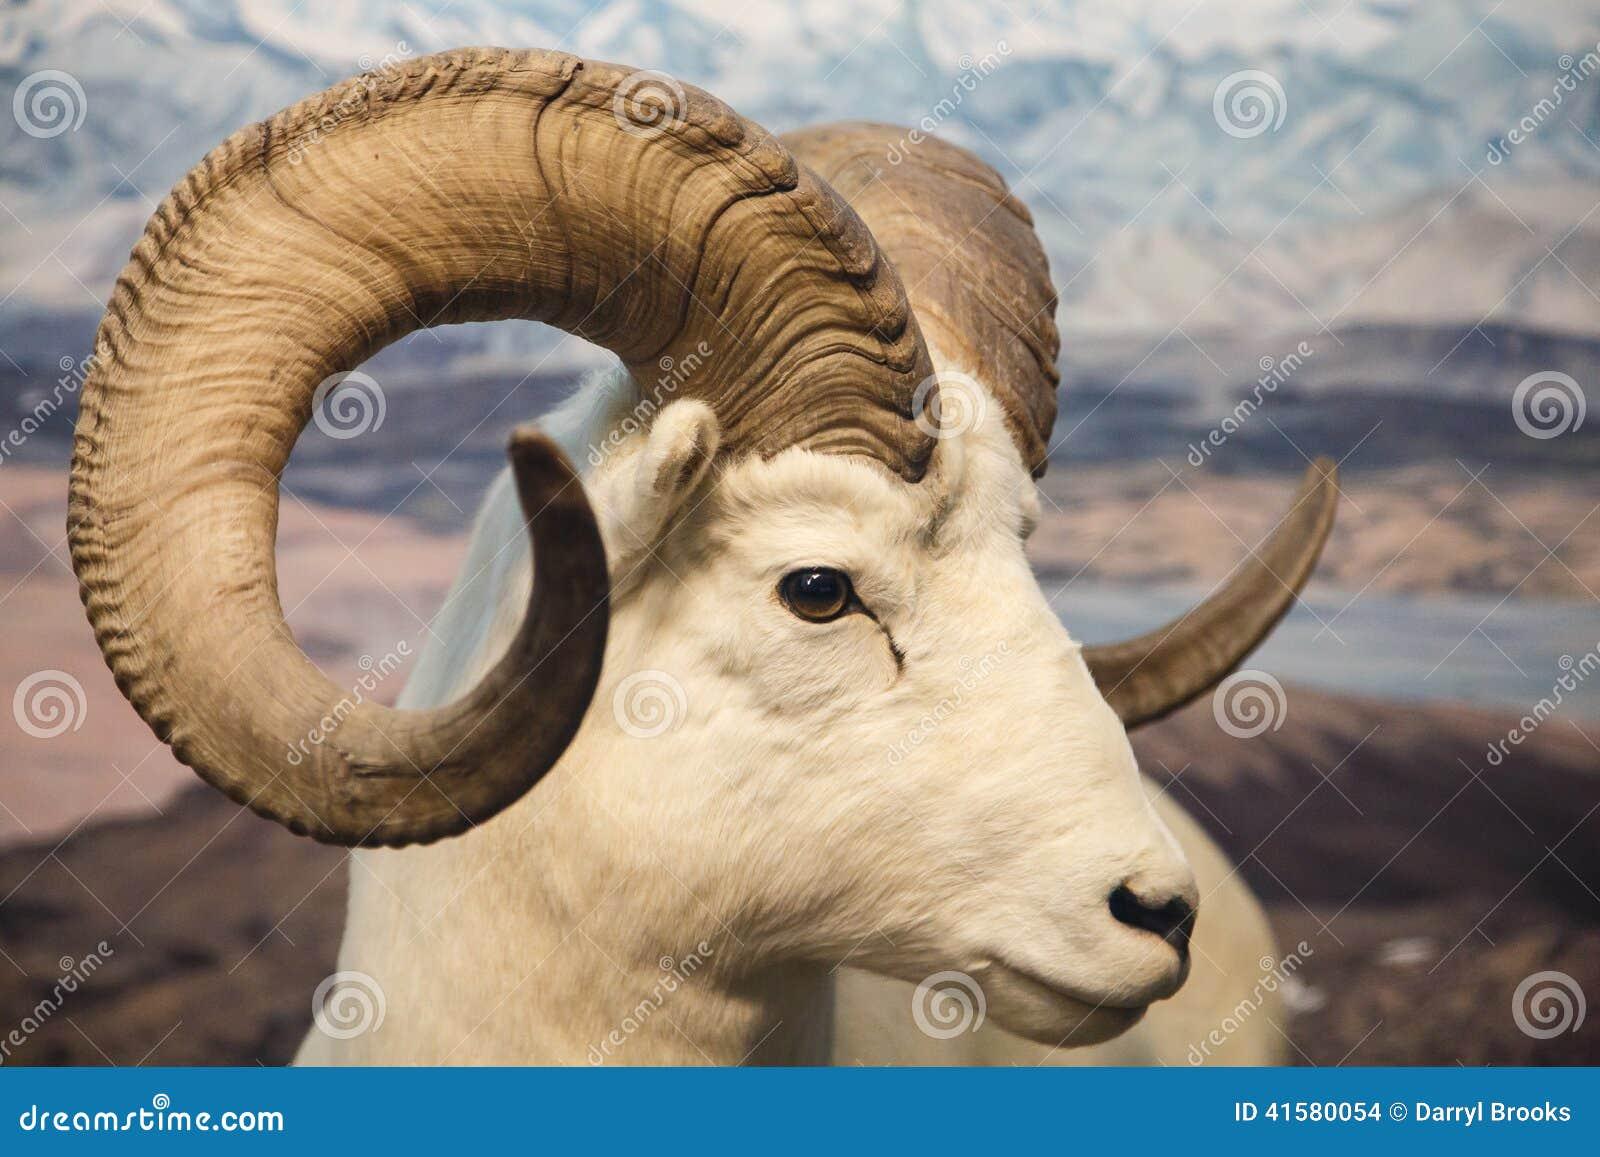 Big Horn Sheep Close